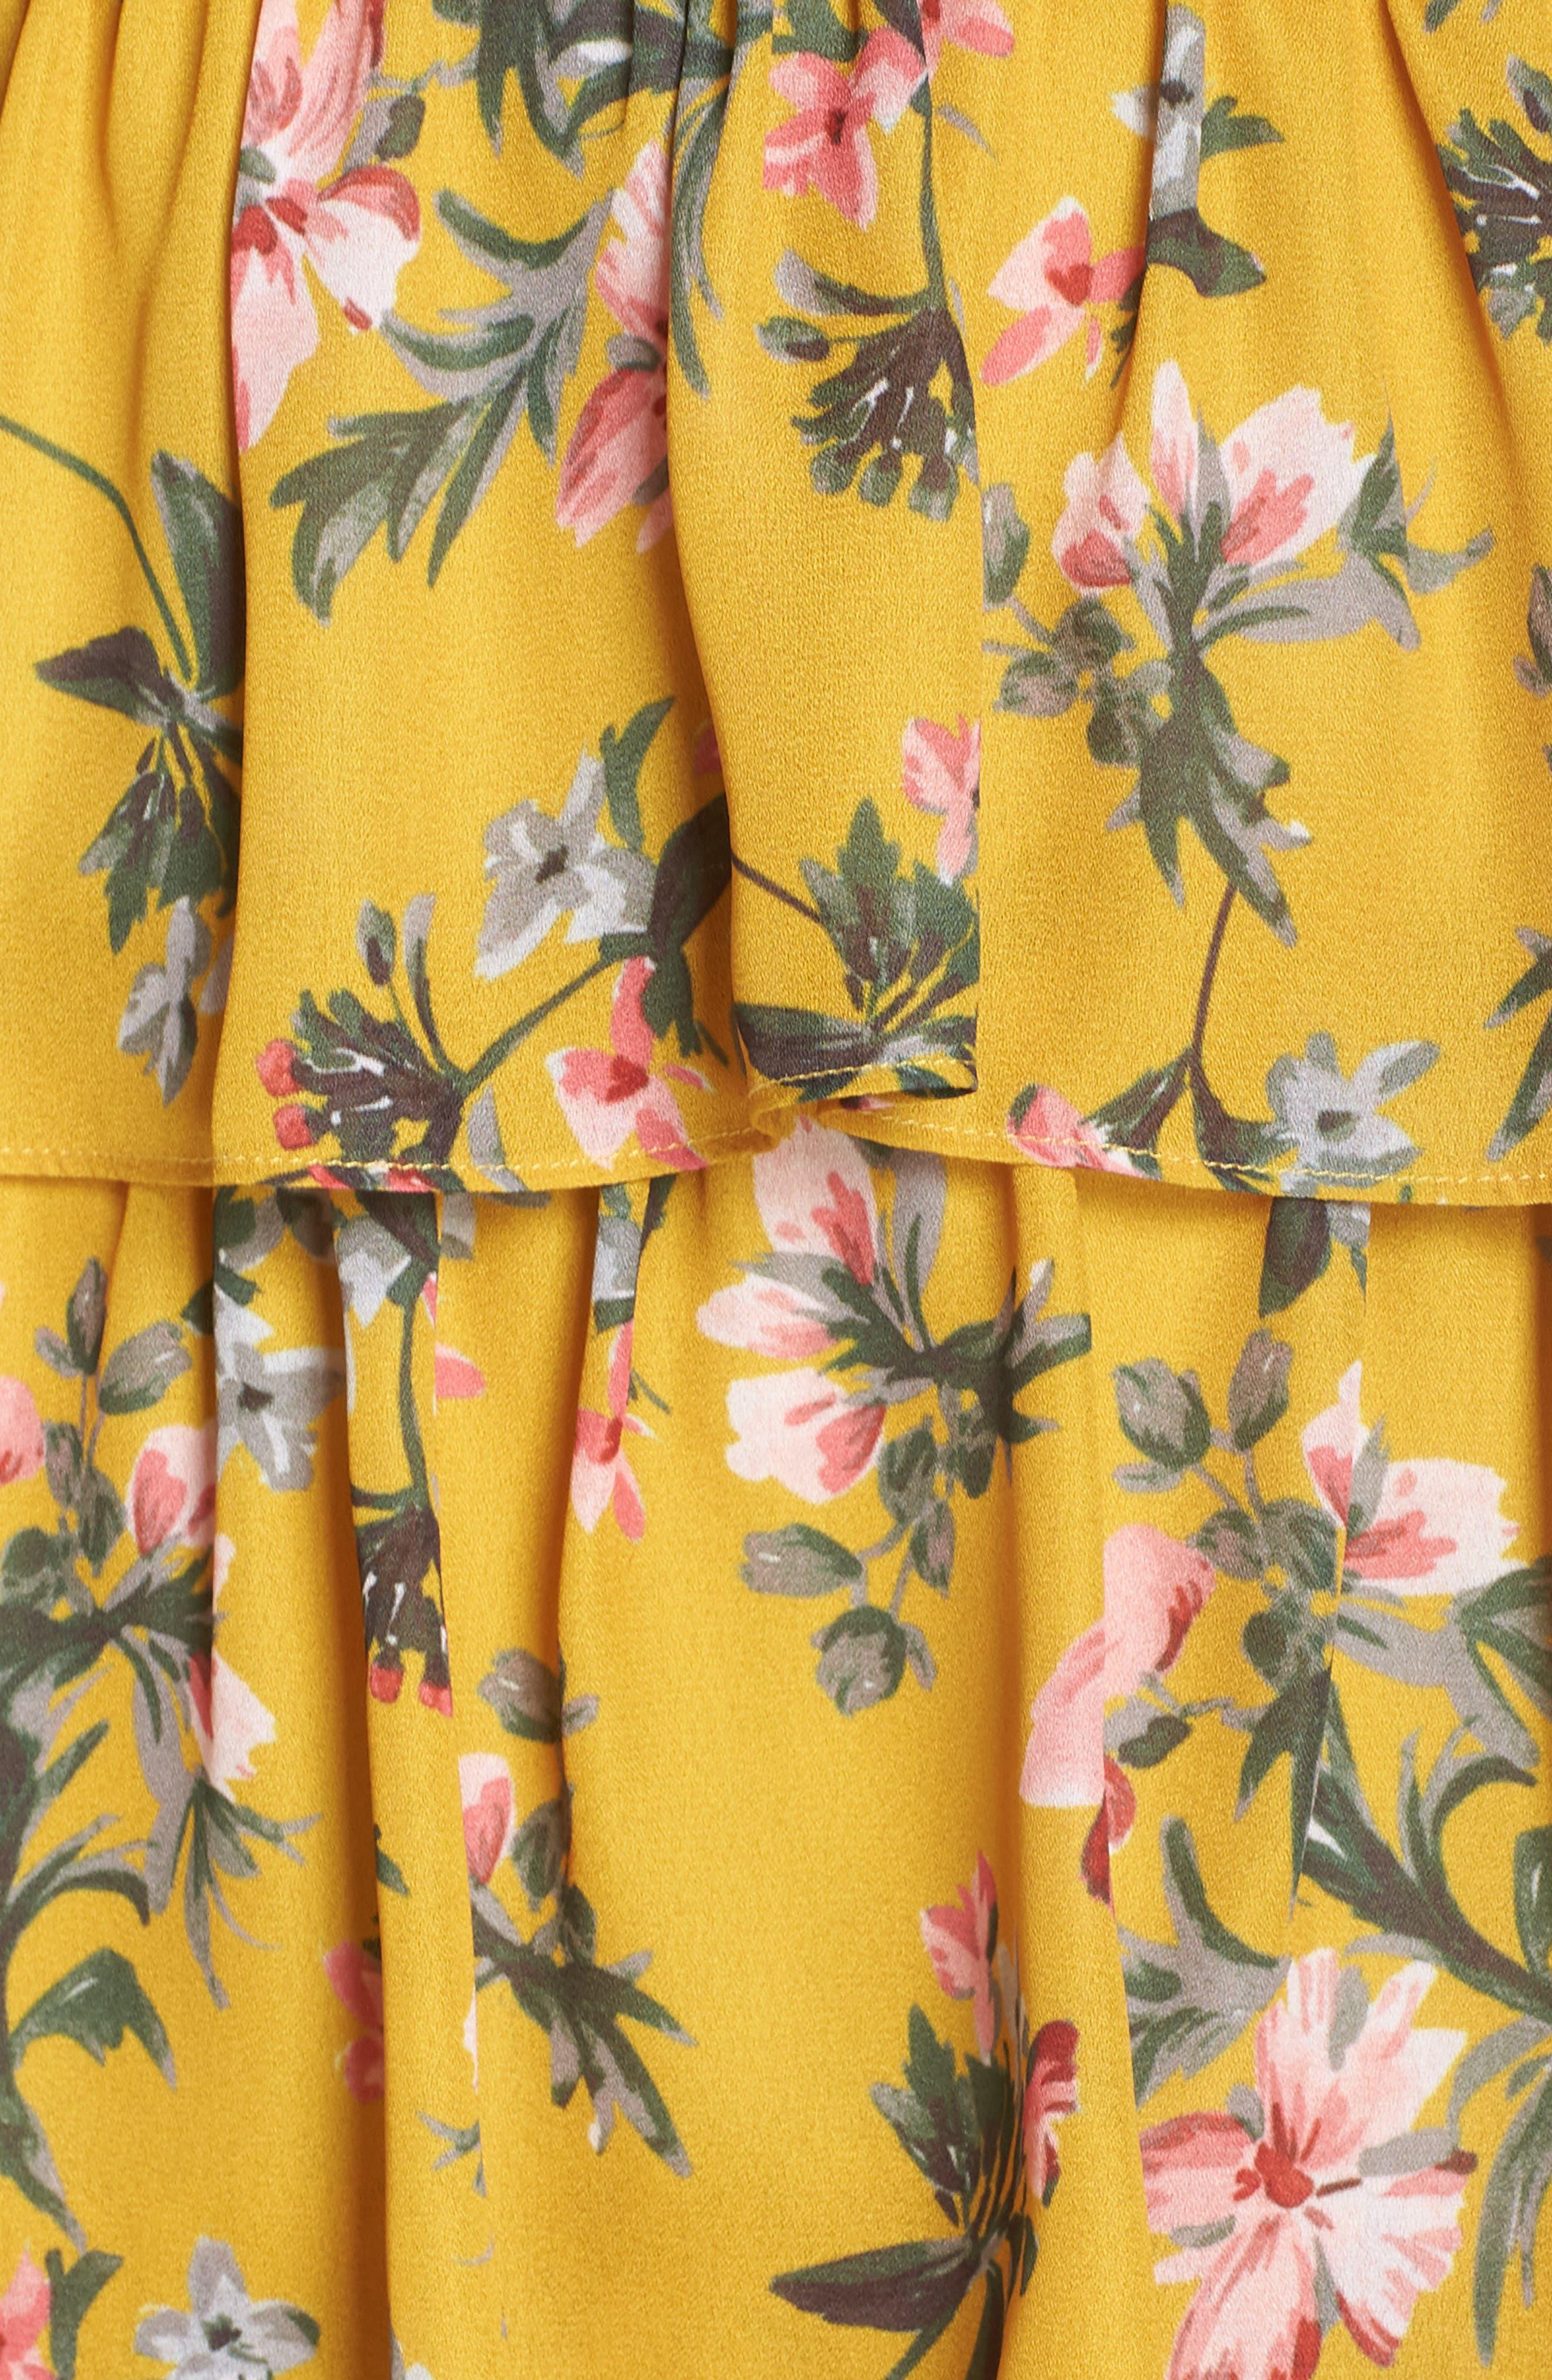 Floral Ruffle Dress,                             Alternate thumbnail 6, color,                             MARIGOLD MULTI